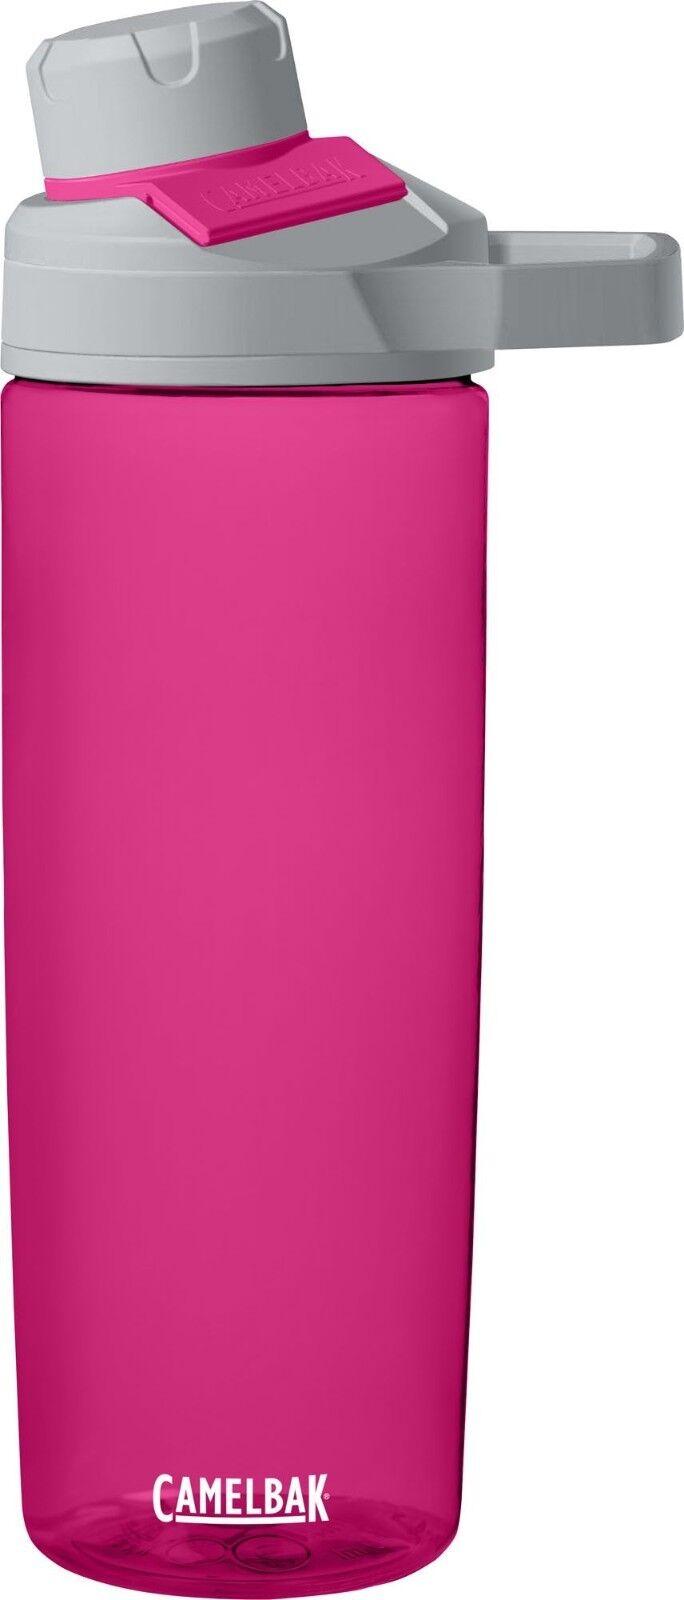 Camelbak Chute Mag 20 oz oz oz (environ 566.98 g) (.6 L) bouteille d'eau, Sports Hydratation ballon/cantine 25fbfe